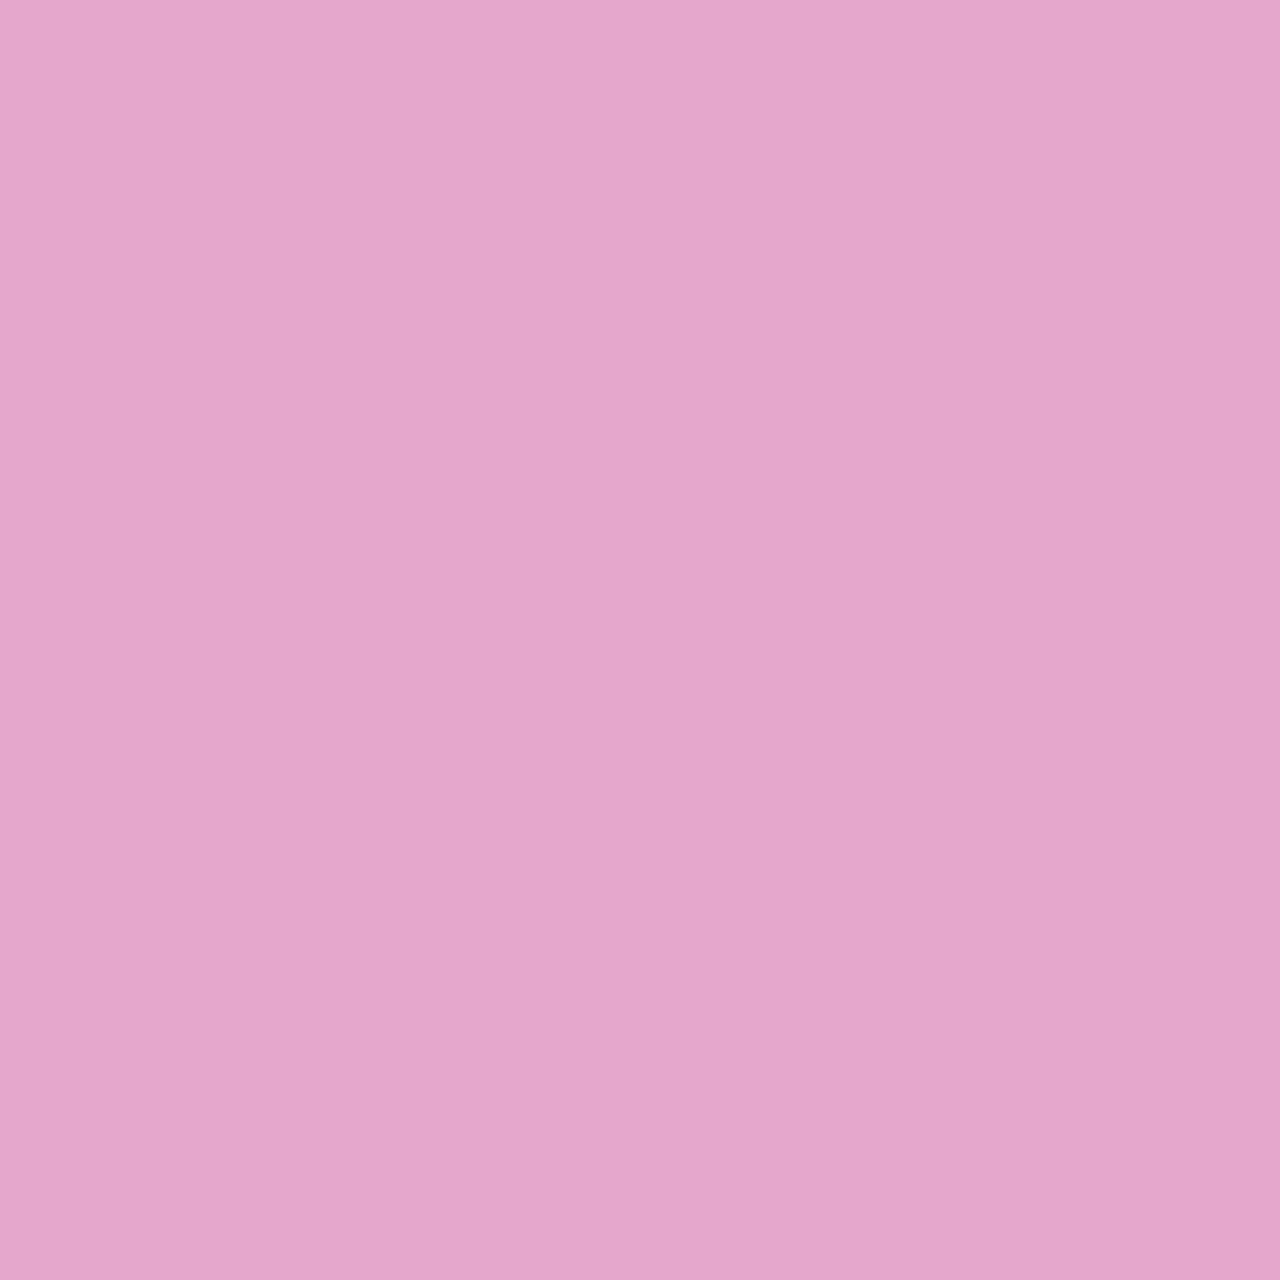 "#0337 Rosco Gels Roscolux True Pink, 20x24"""